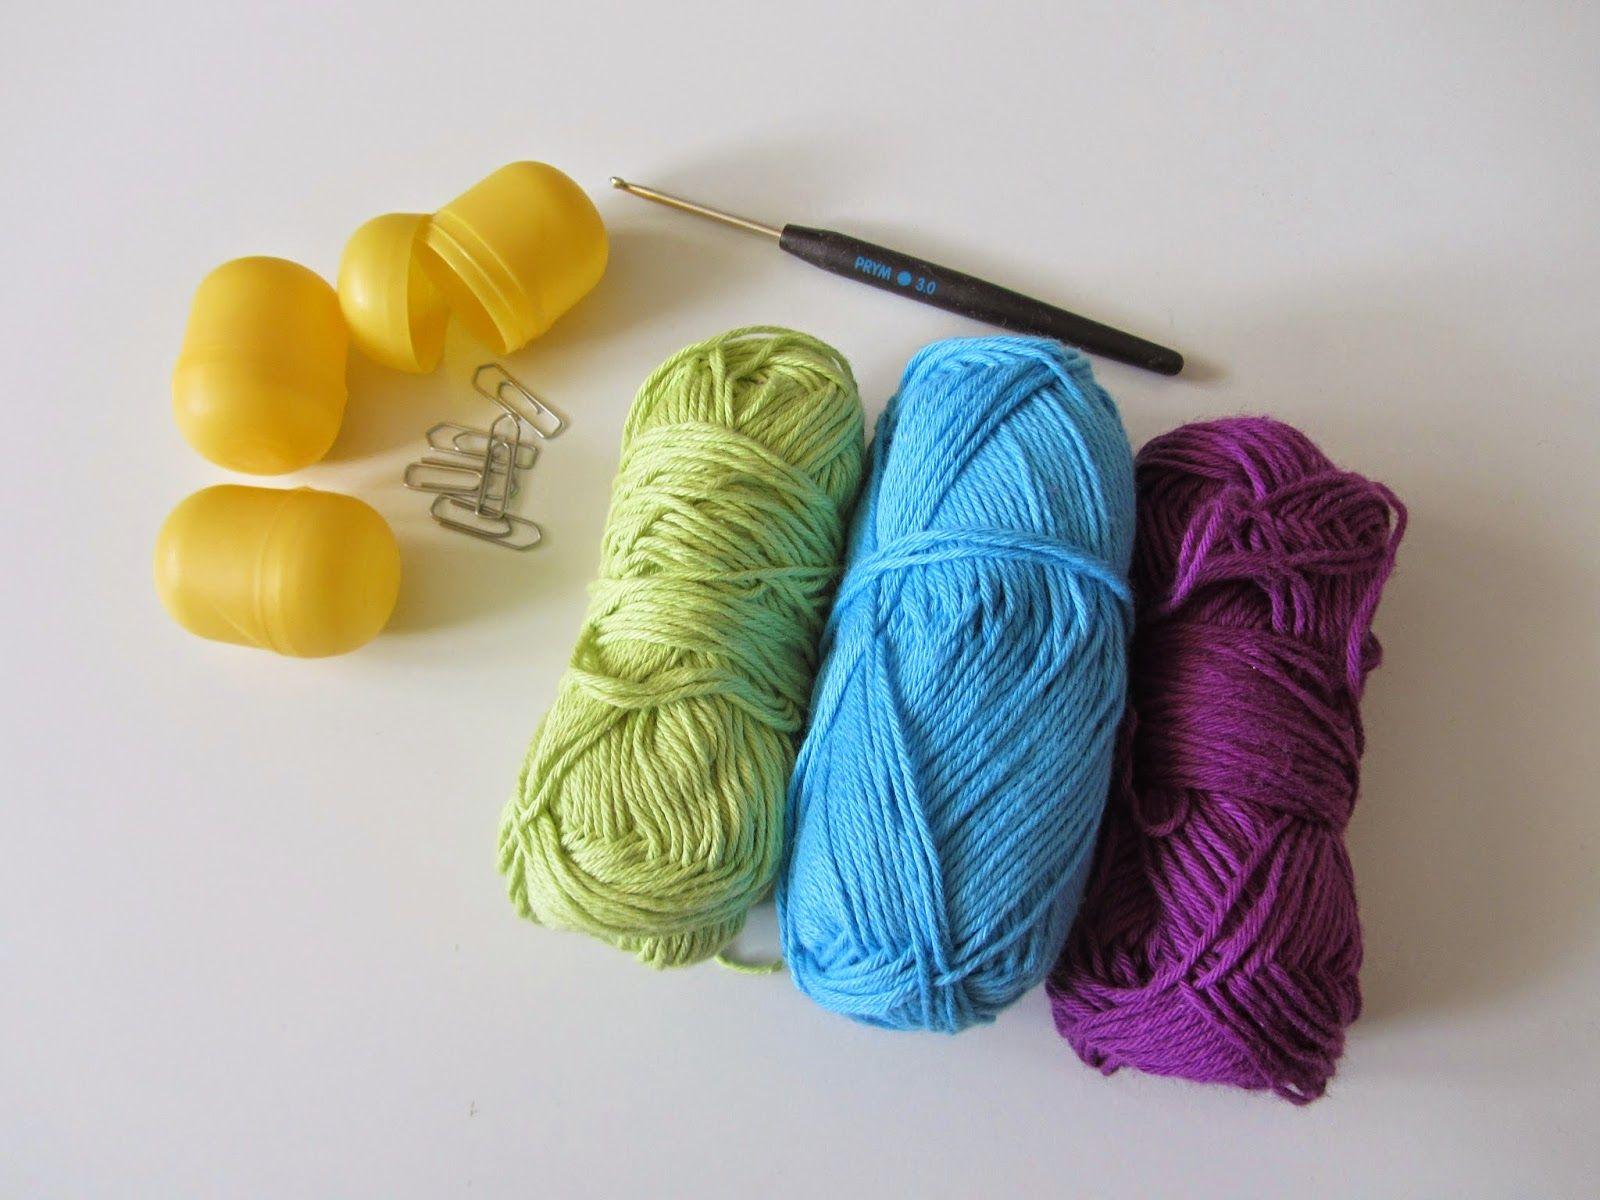 Liebenswelt Babyrassel Häkeln Upcycling ü Eier Crochet